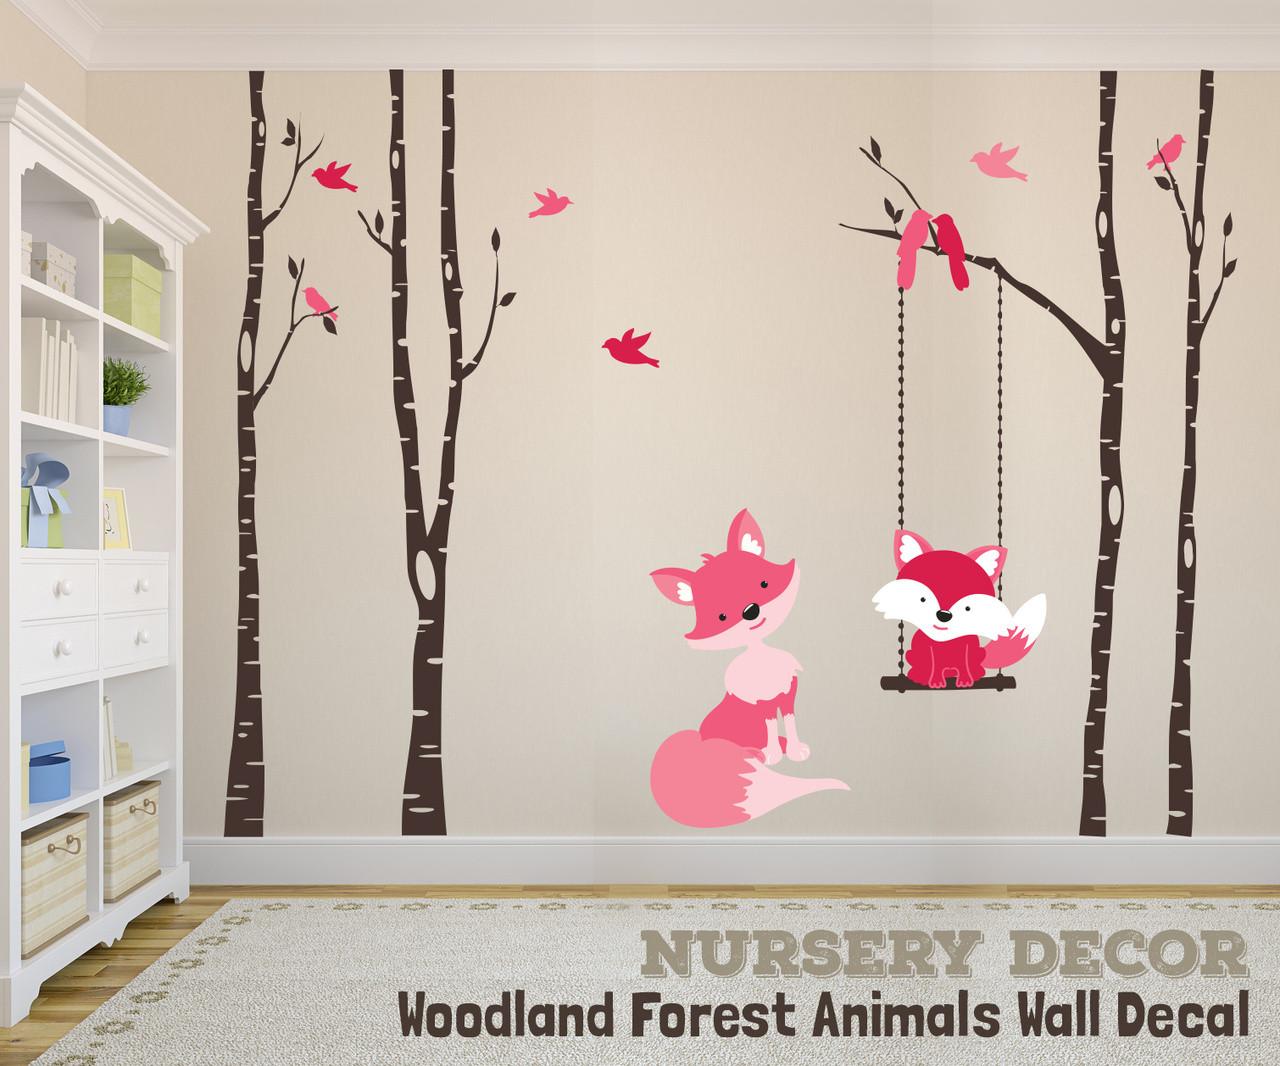 FOX FAMILY Woodland Nursery Decor Wall Decal 4 River Birch Nursery Trees Decor Baby Fox Swings from Branch Forest Birds Vinyl Baby Bedroom